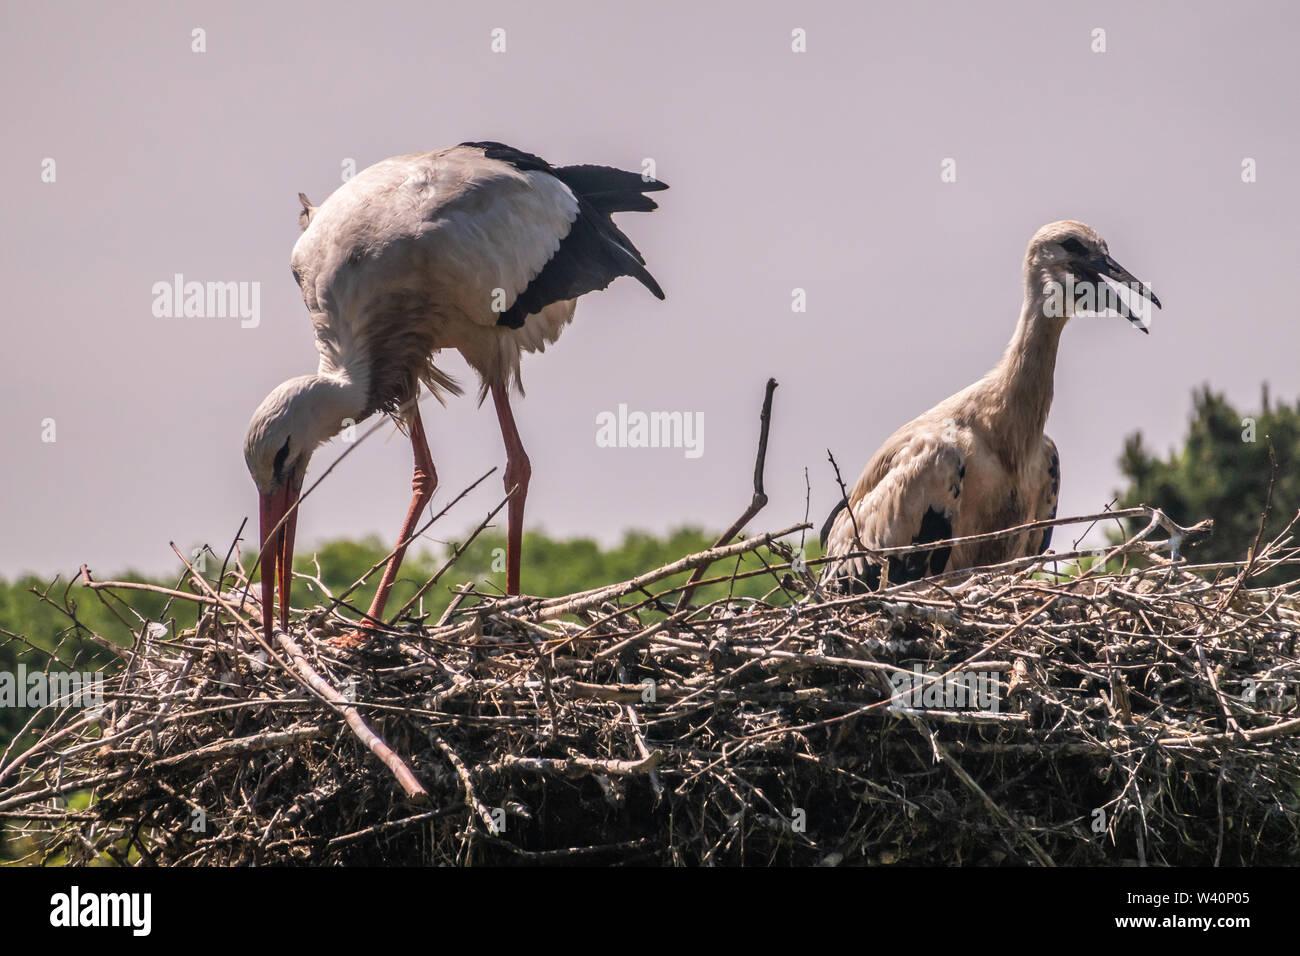 Knokke-Heist, Flanders, Belgium -  June 18, 2019: Zwin Bird Refuge. Closeup of adult stork adjusting nest plus chick against evening sky. green foliag - Stock Image